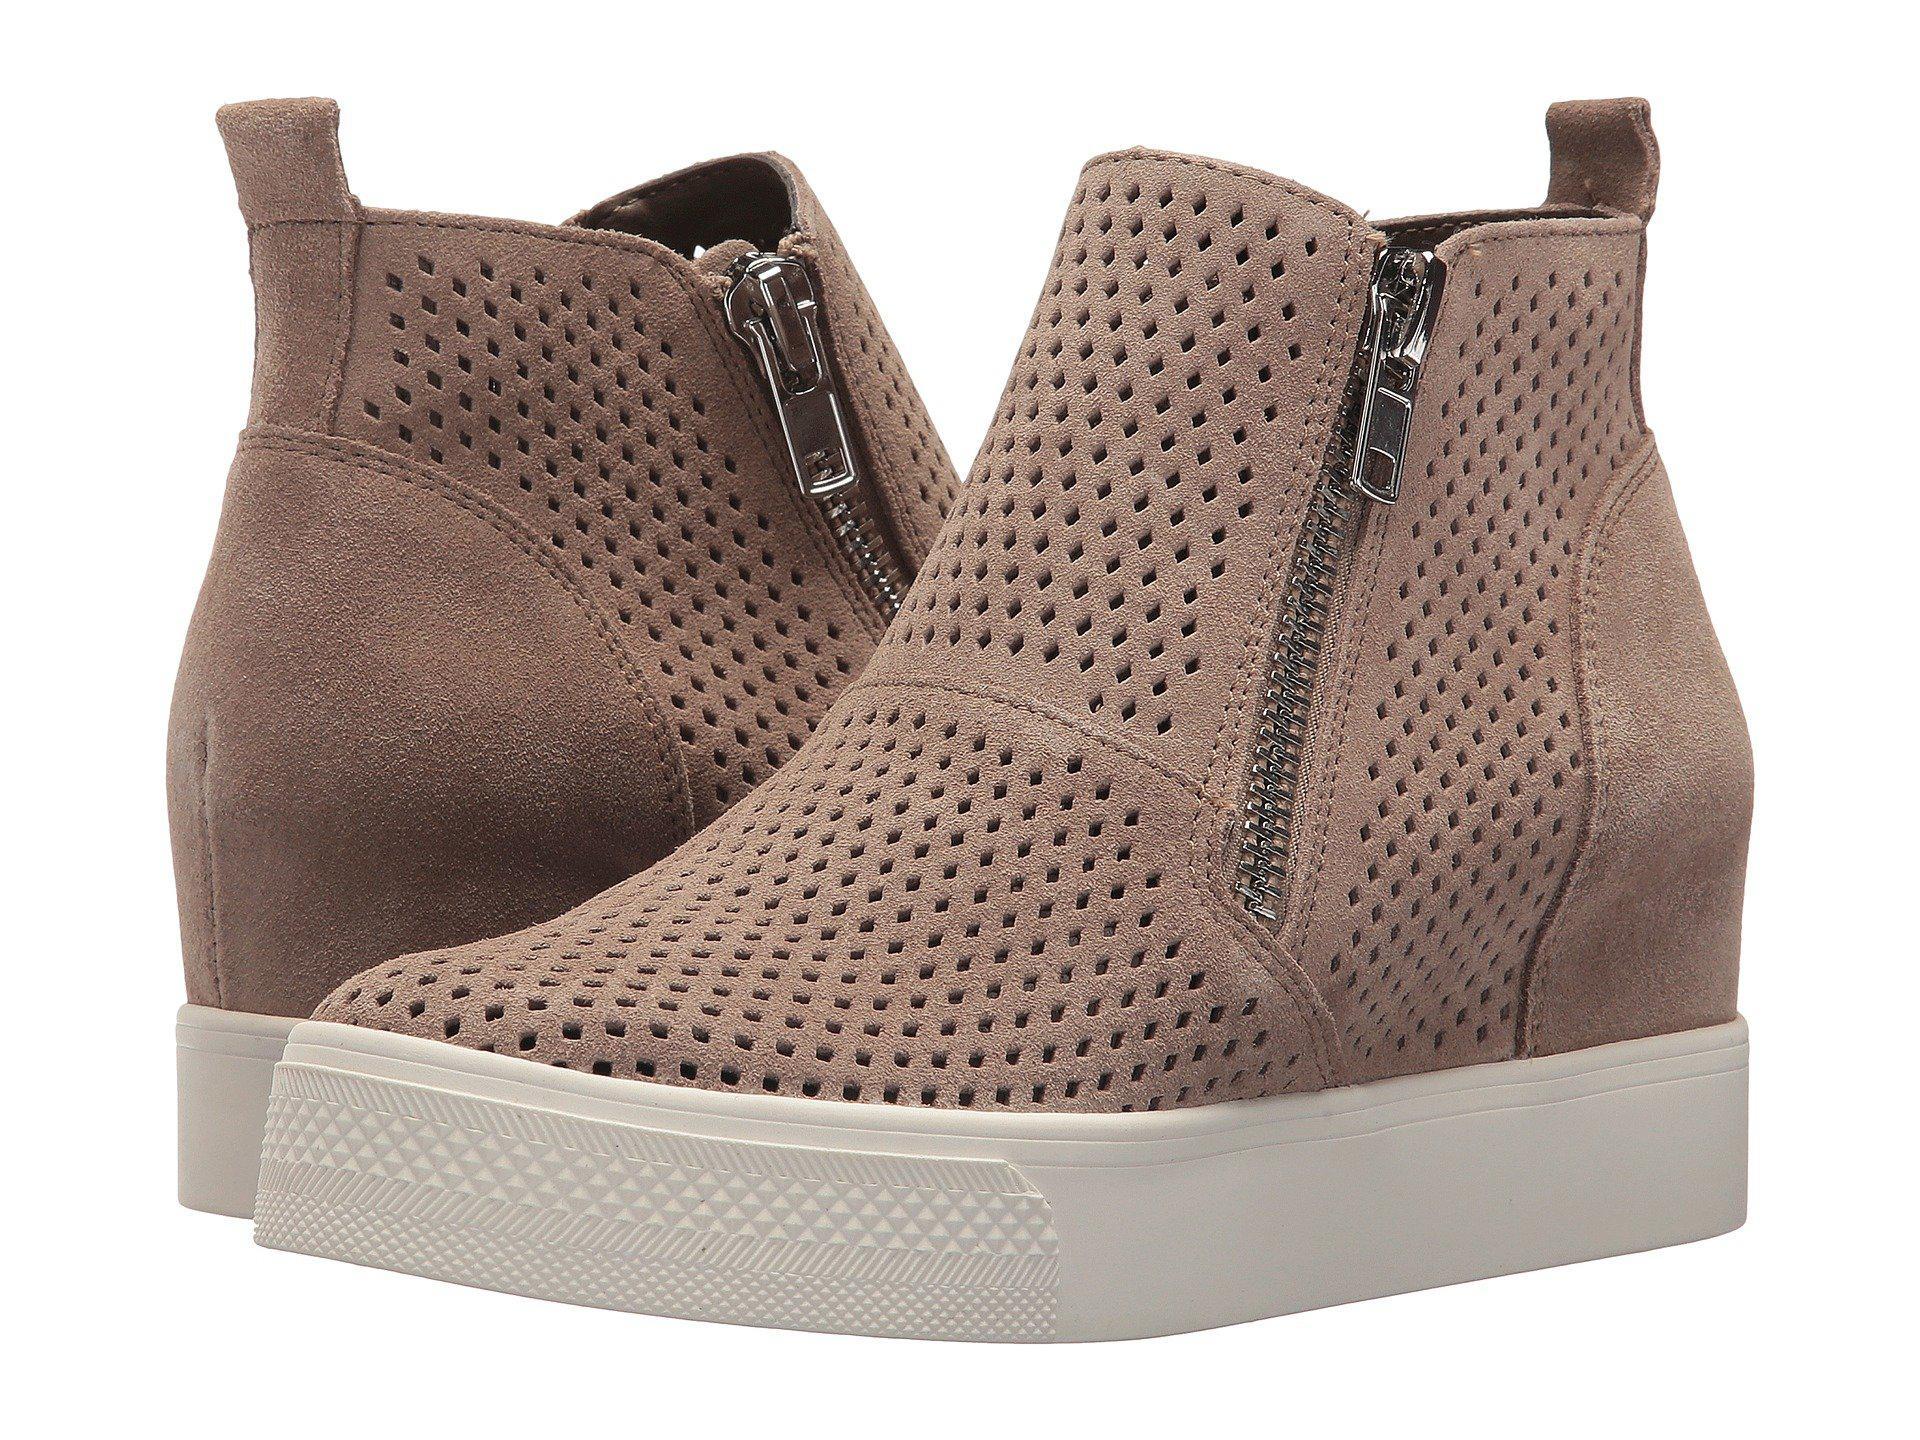 49dad7774e0 Lyst - Steve Madden Wedgie-p Sneaker (black) Women s Shoes in Brown